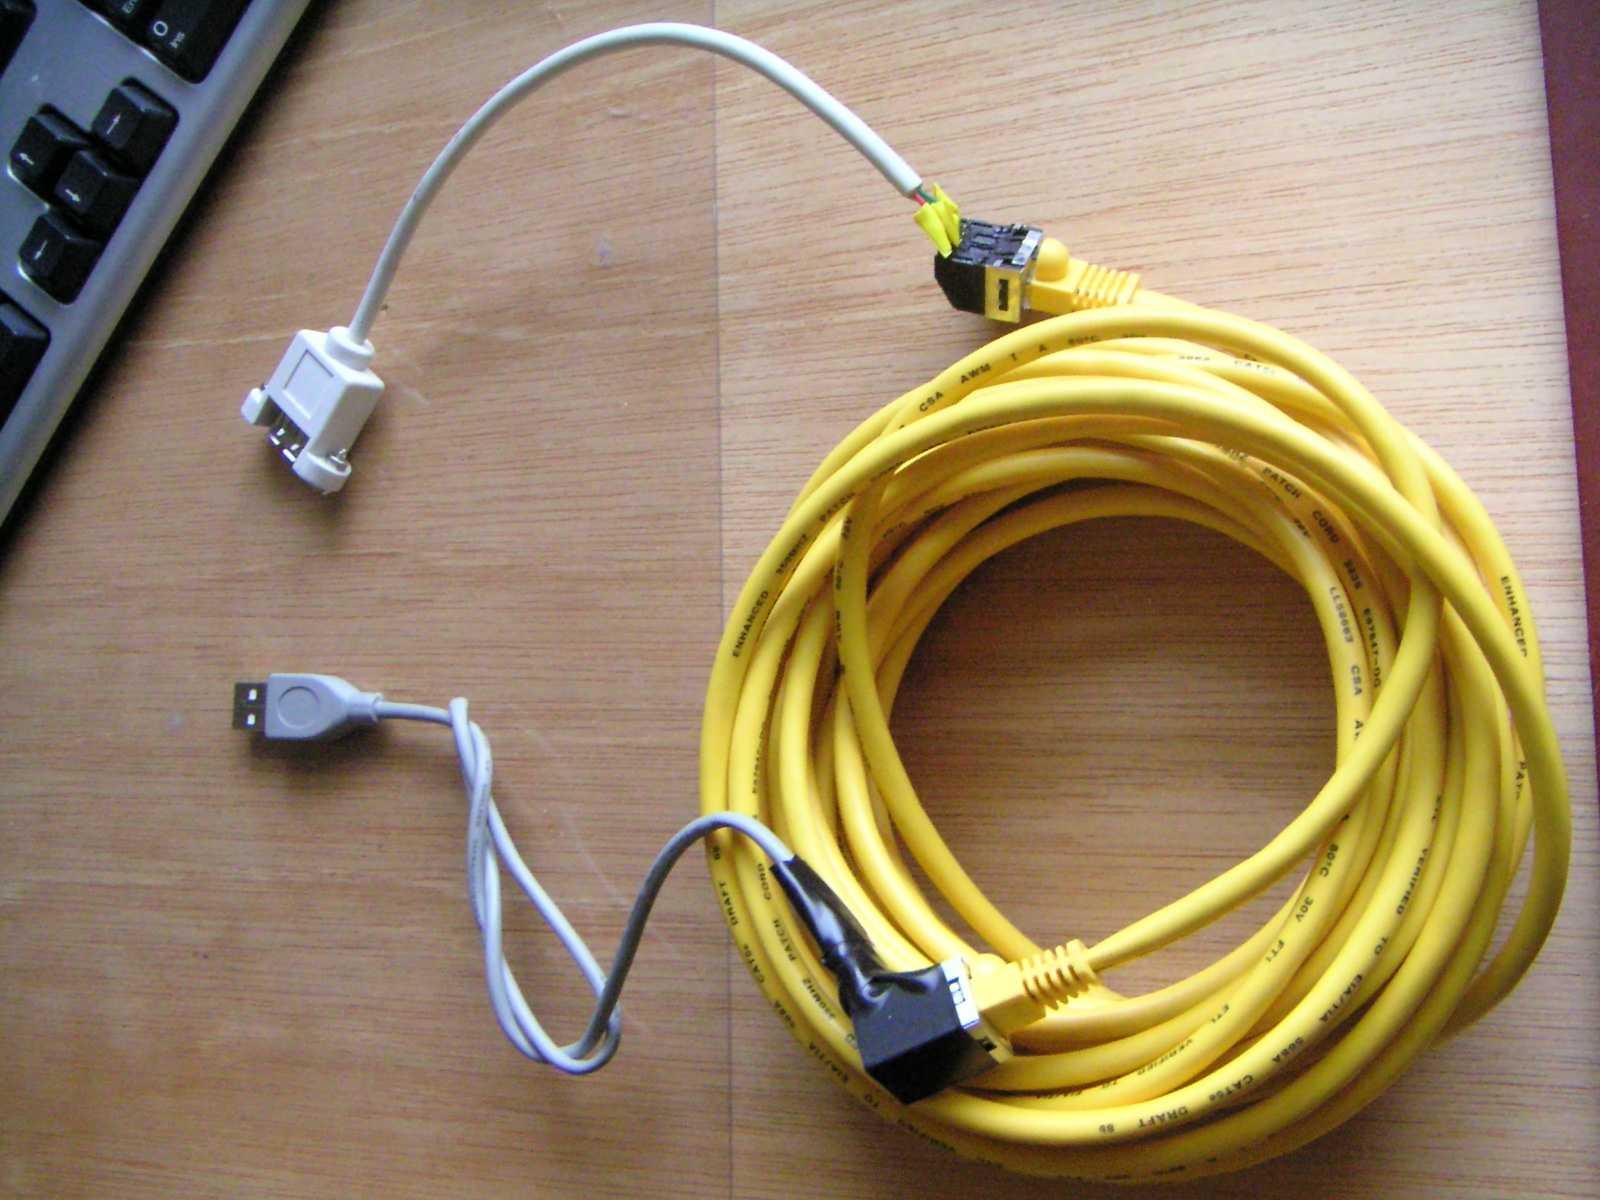 vga over cat5 wiring diagram wiring diagram centre mix vga over cat5 wiring diagram schematic diagramusb [ 1600 x 1200 Pixel ]